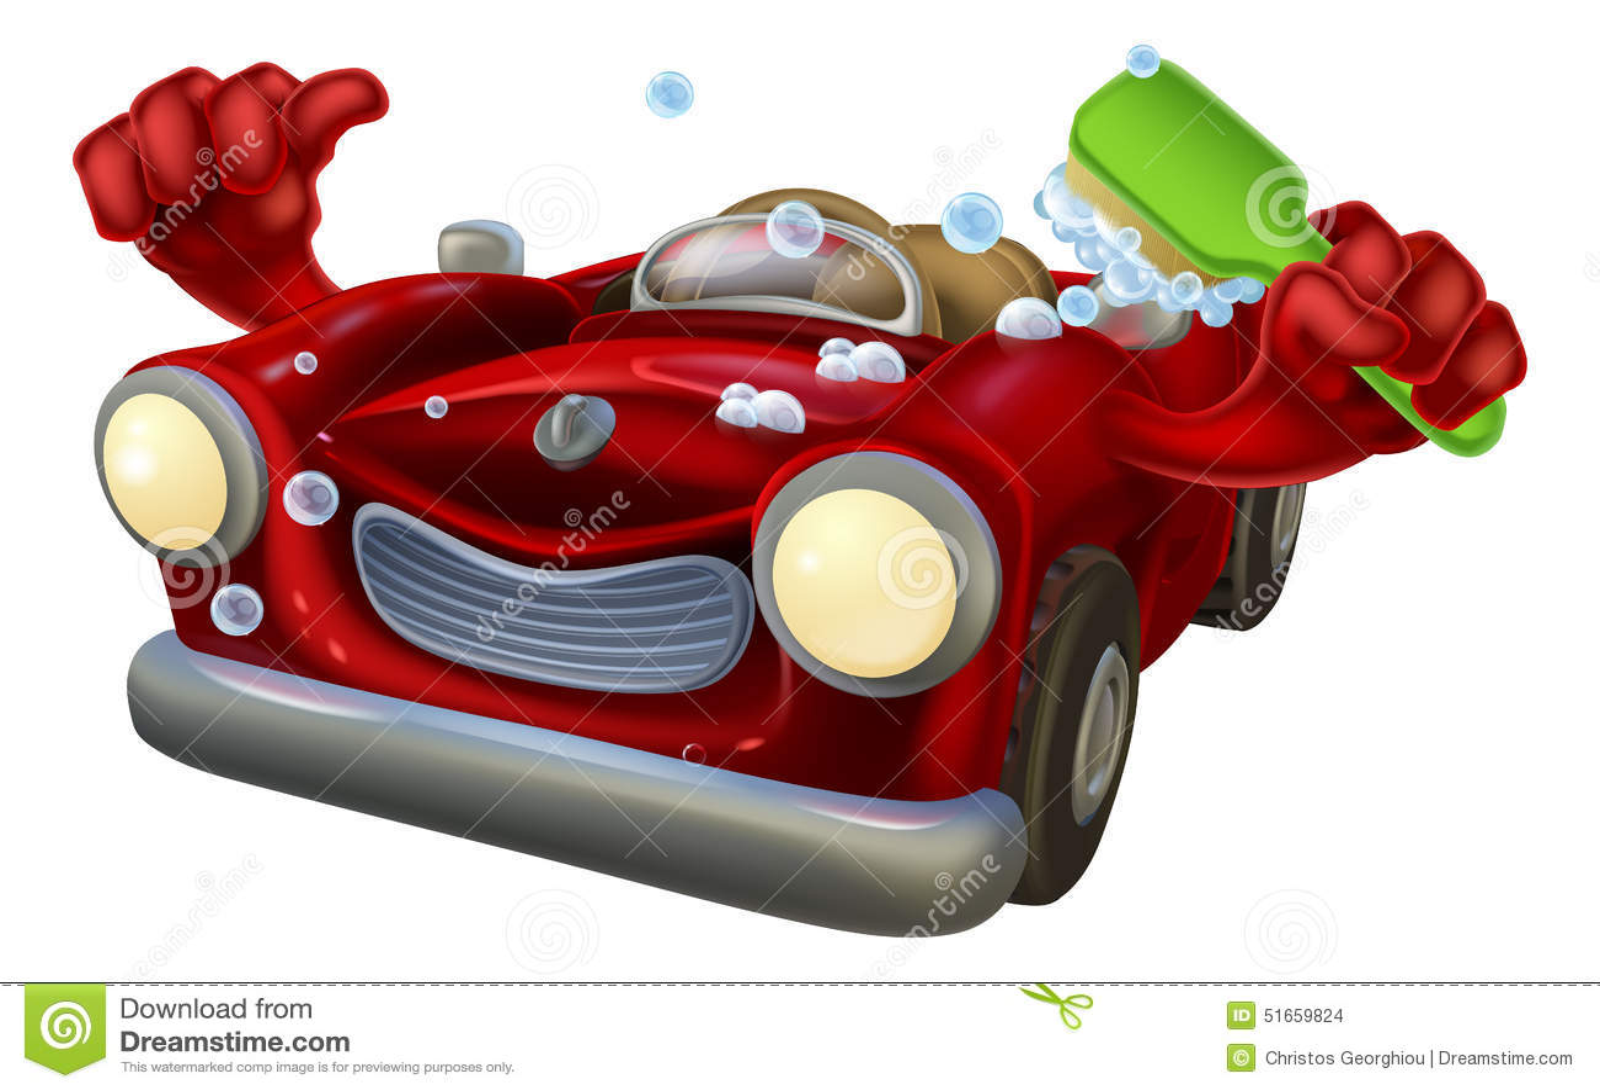 Car Wash Brush >> Carwash Cartoon Stock Vector - Image: 51659824